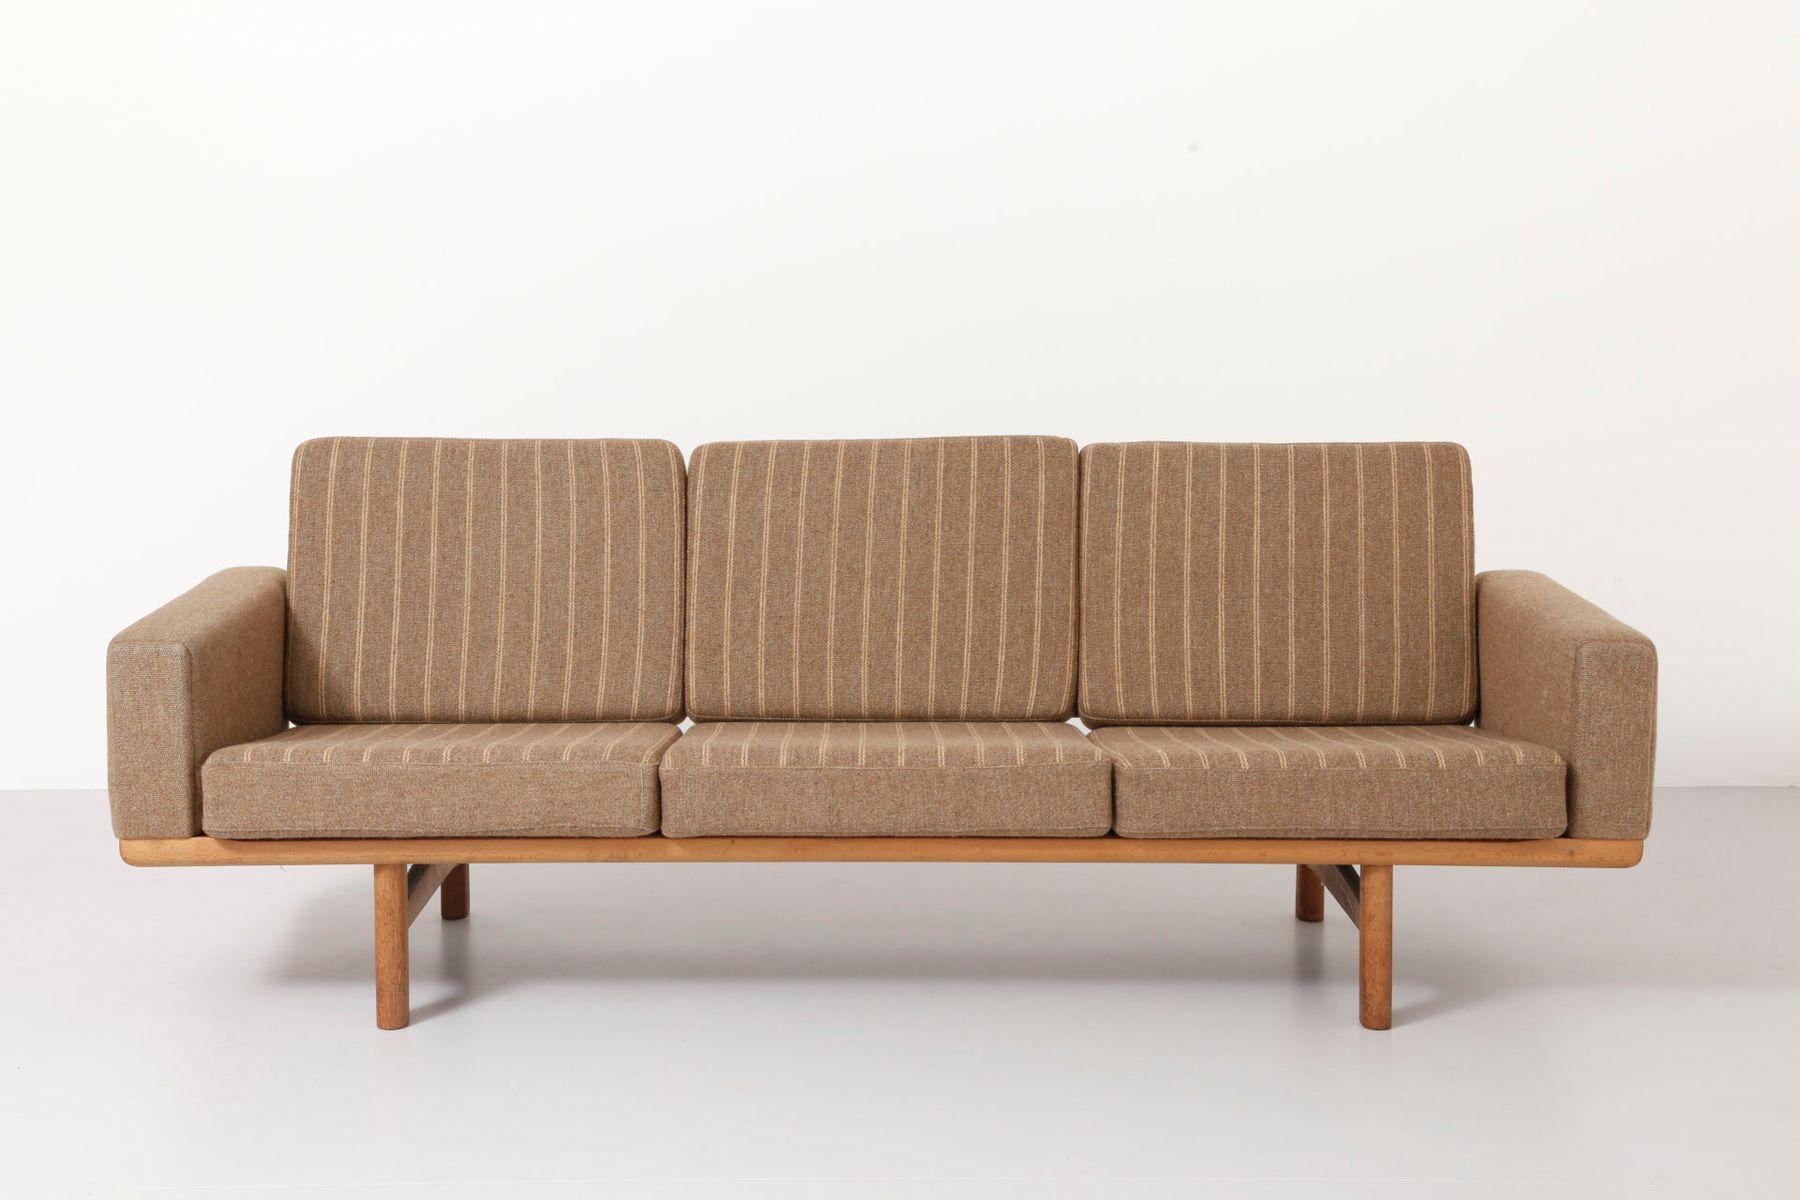 3 seater sofa by hans j wegner for getama for sale at pamono. Black Bedroom Furniture Sets. Home Design Ideas